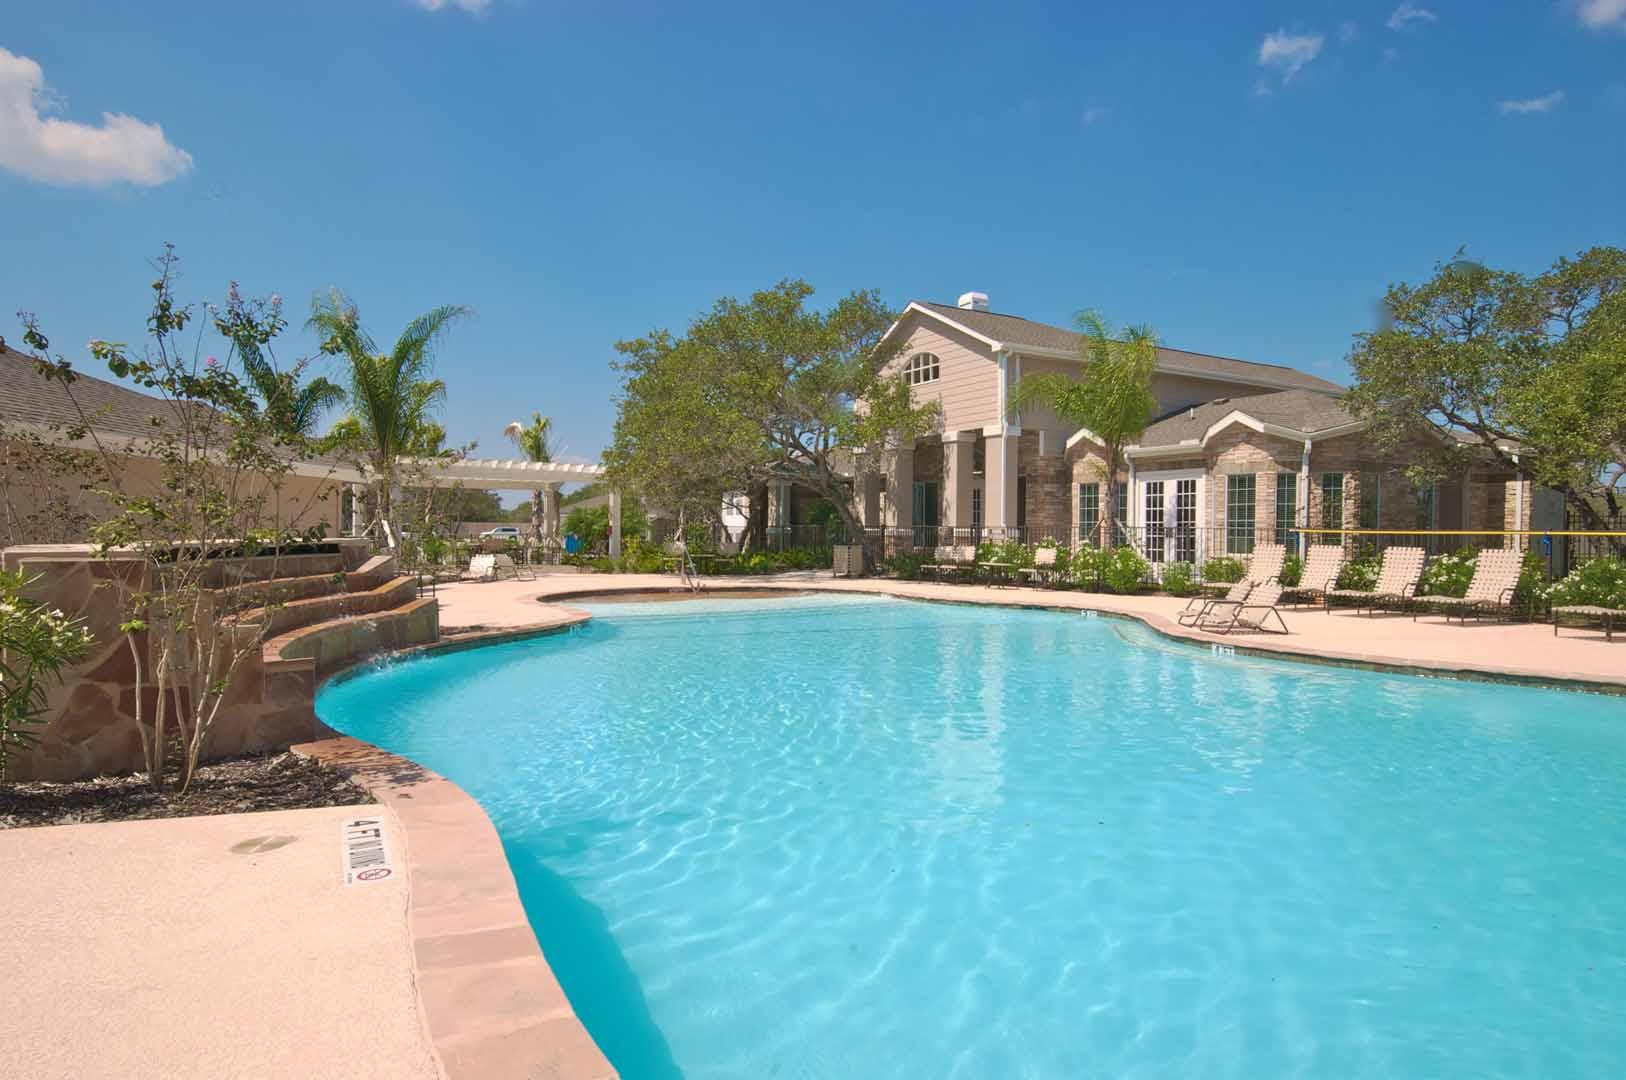 pool-oaks-at-bentwater-corpus-murphys-corporate-lodging-1